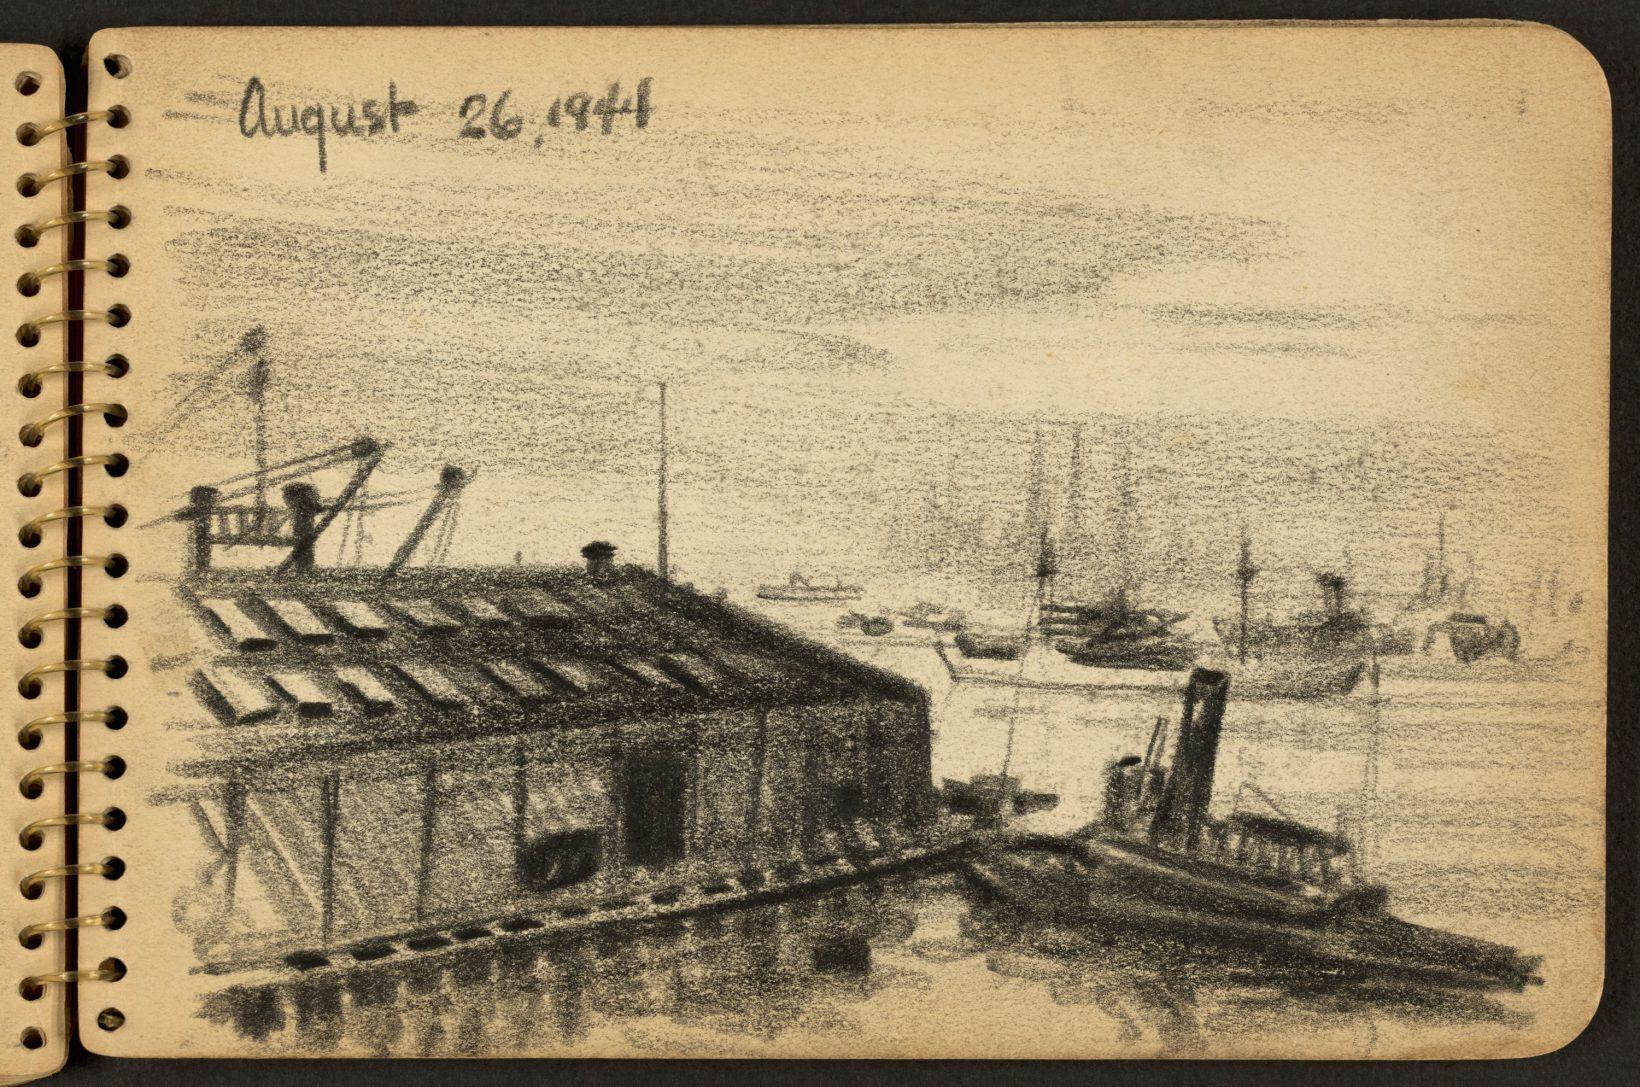 victor-lundy-carnet-croquis-seconde-guerre-mondiale-29